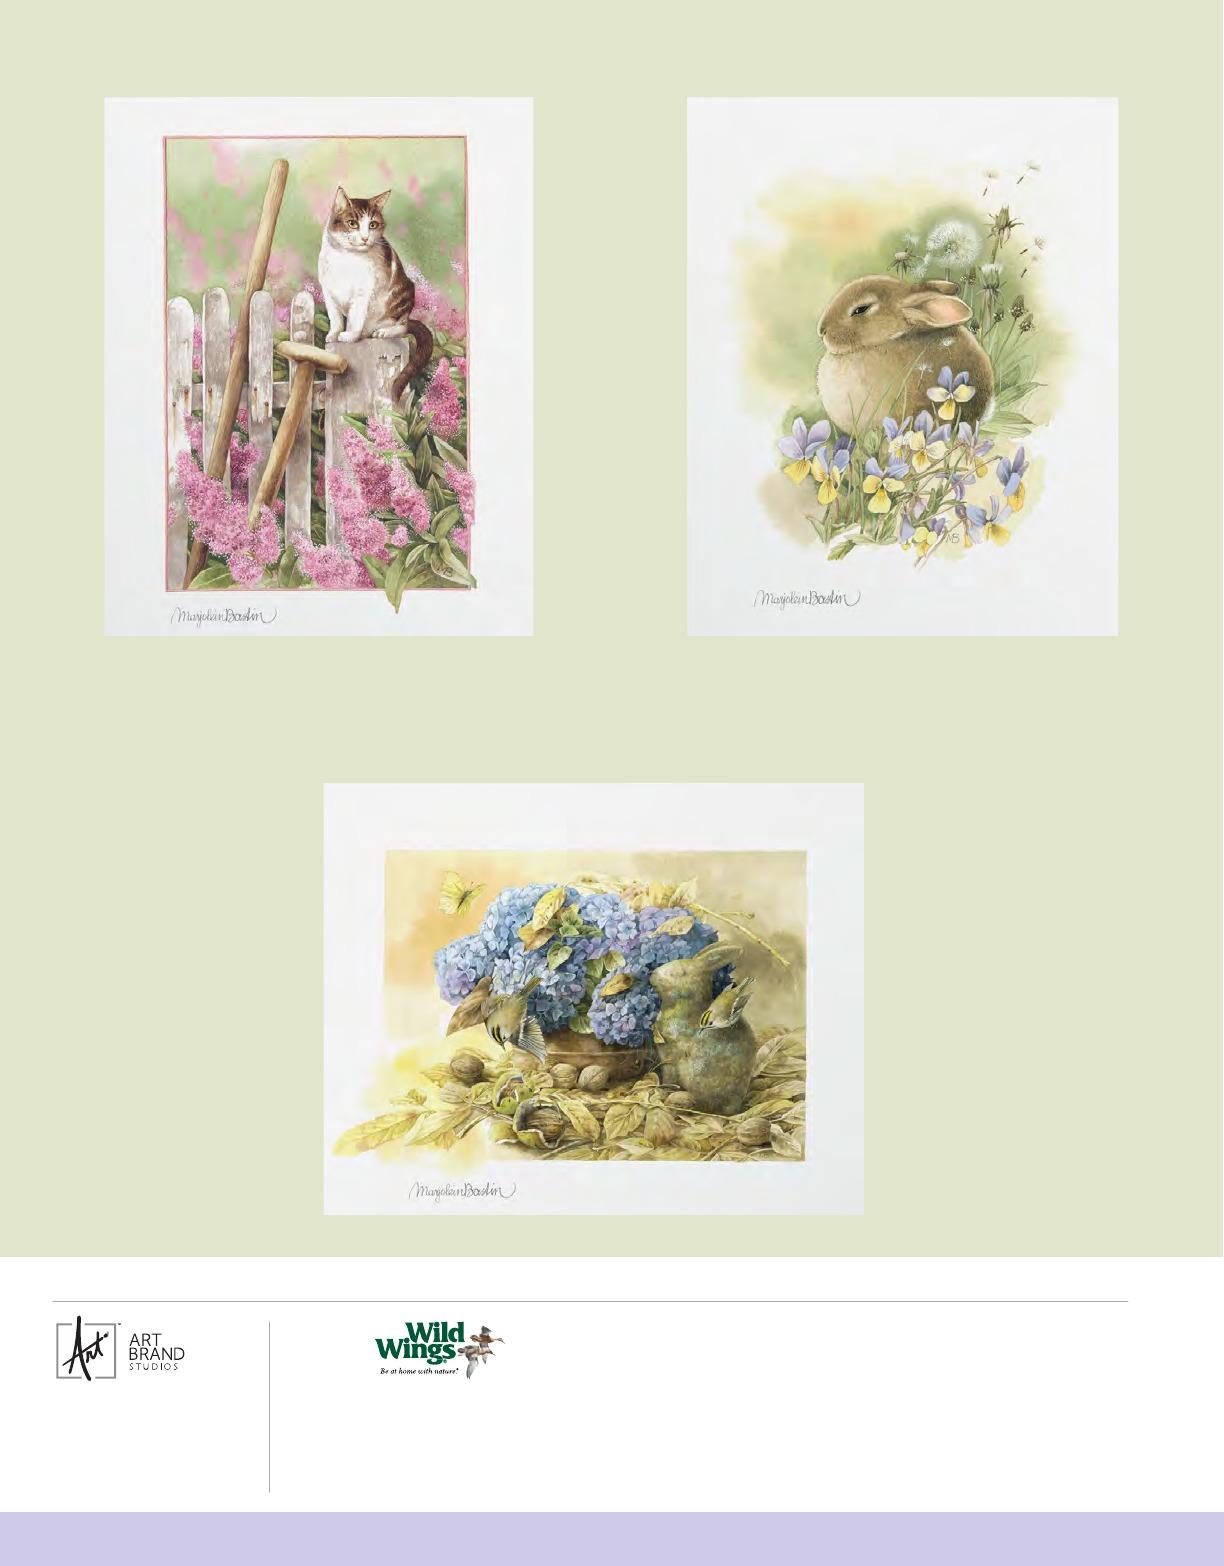 Marjolein Bastin Purple Passion Bouquet 10 x 10 Gallery Wrapped Canvas